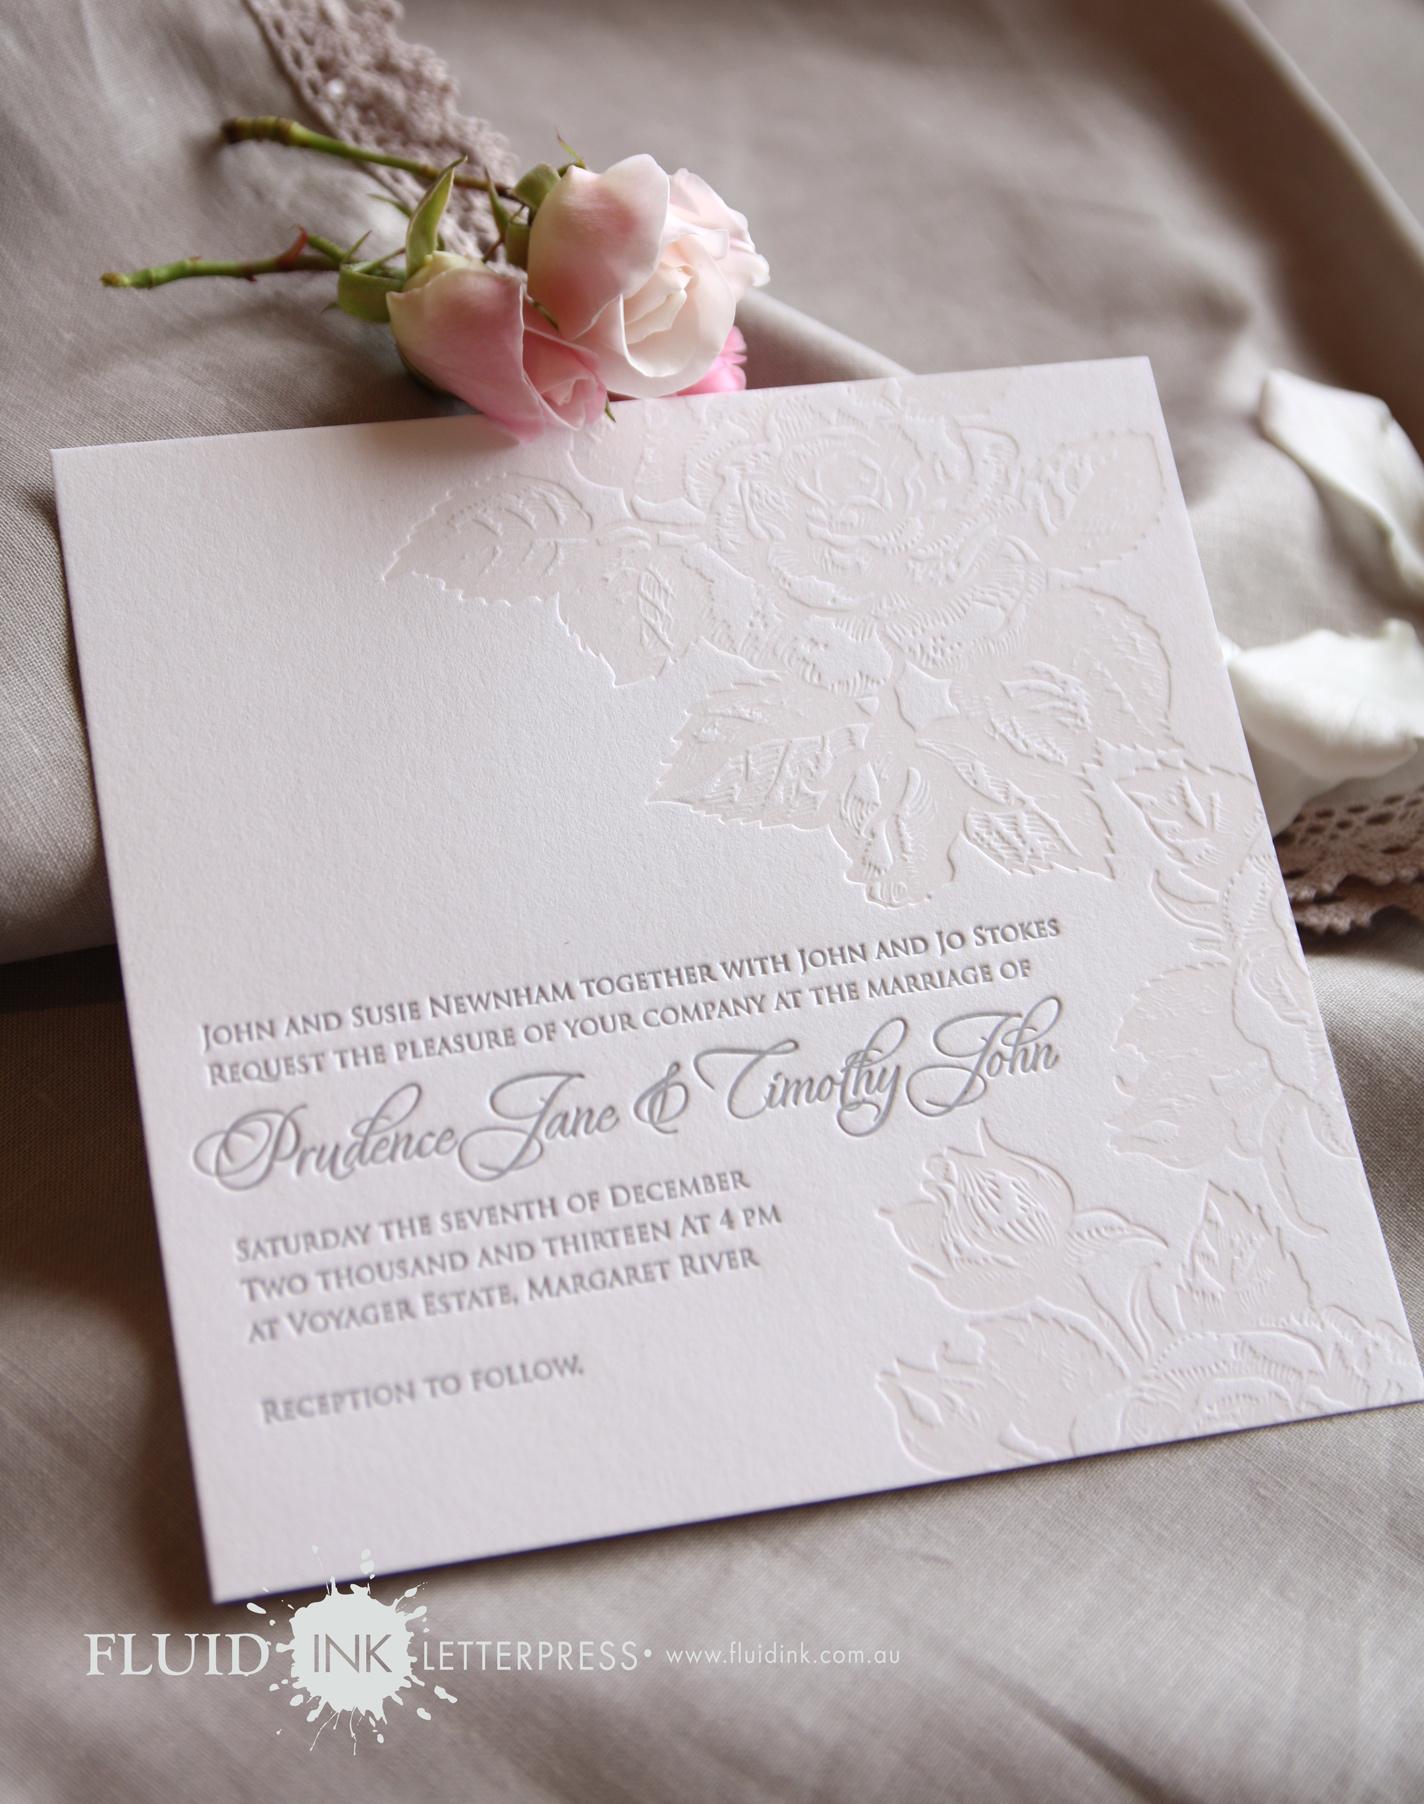 Rose Garden Letterpress invitation 1